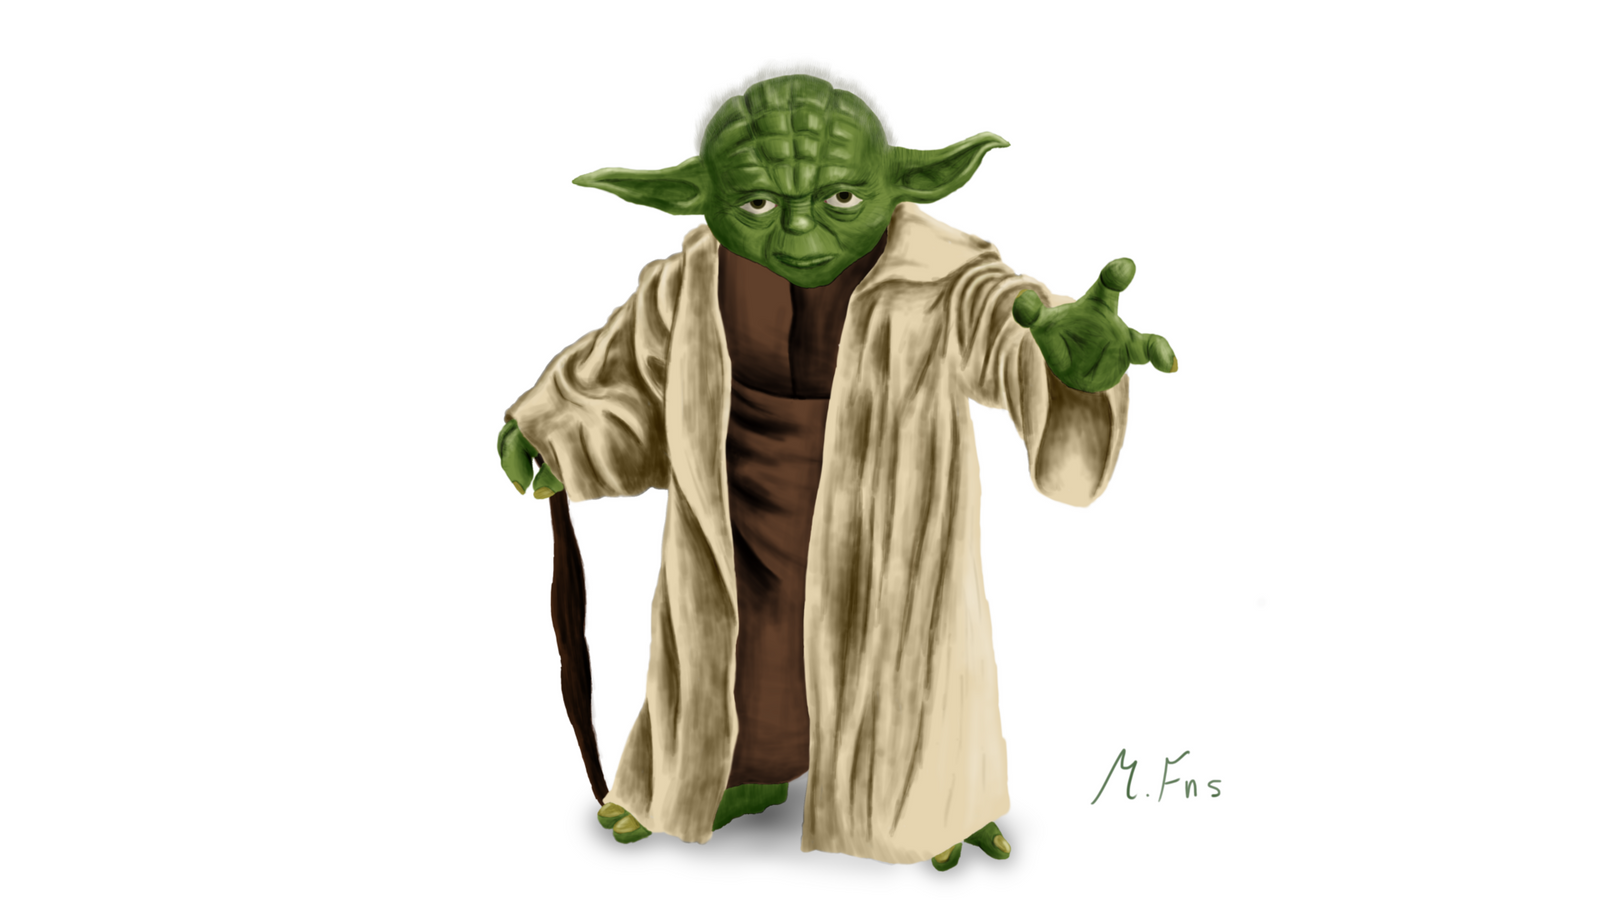 Master Yoda by MarcFenselau on DeviantArt - photo#17